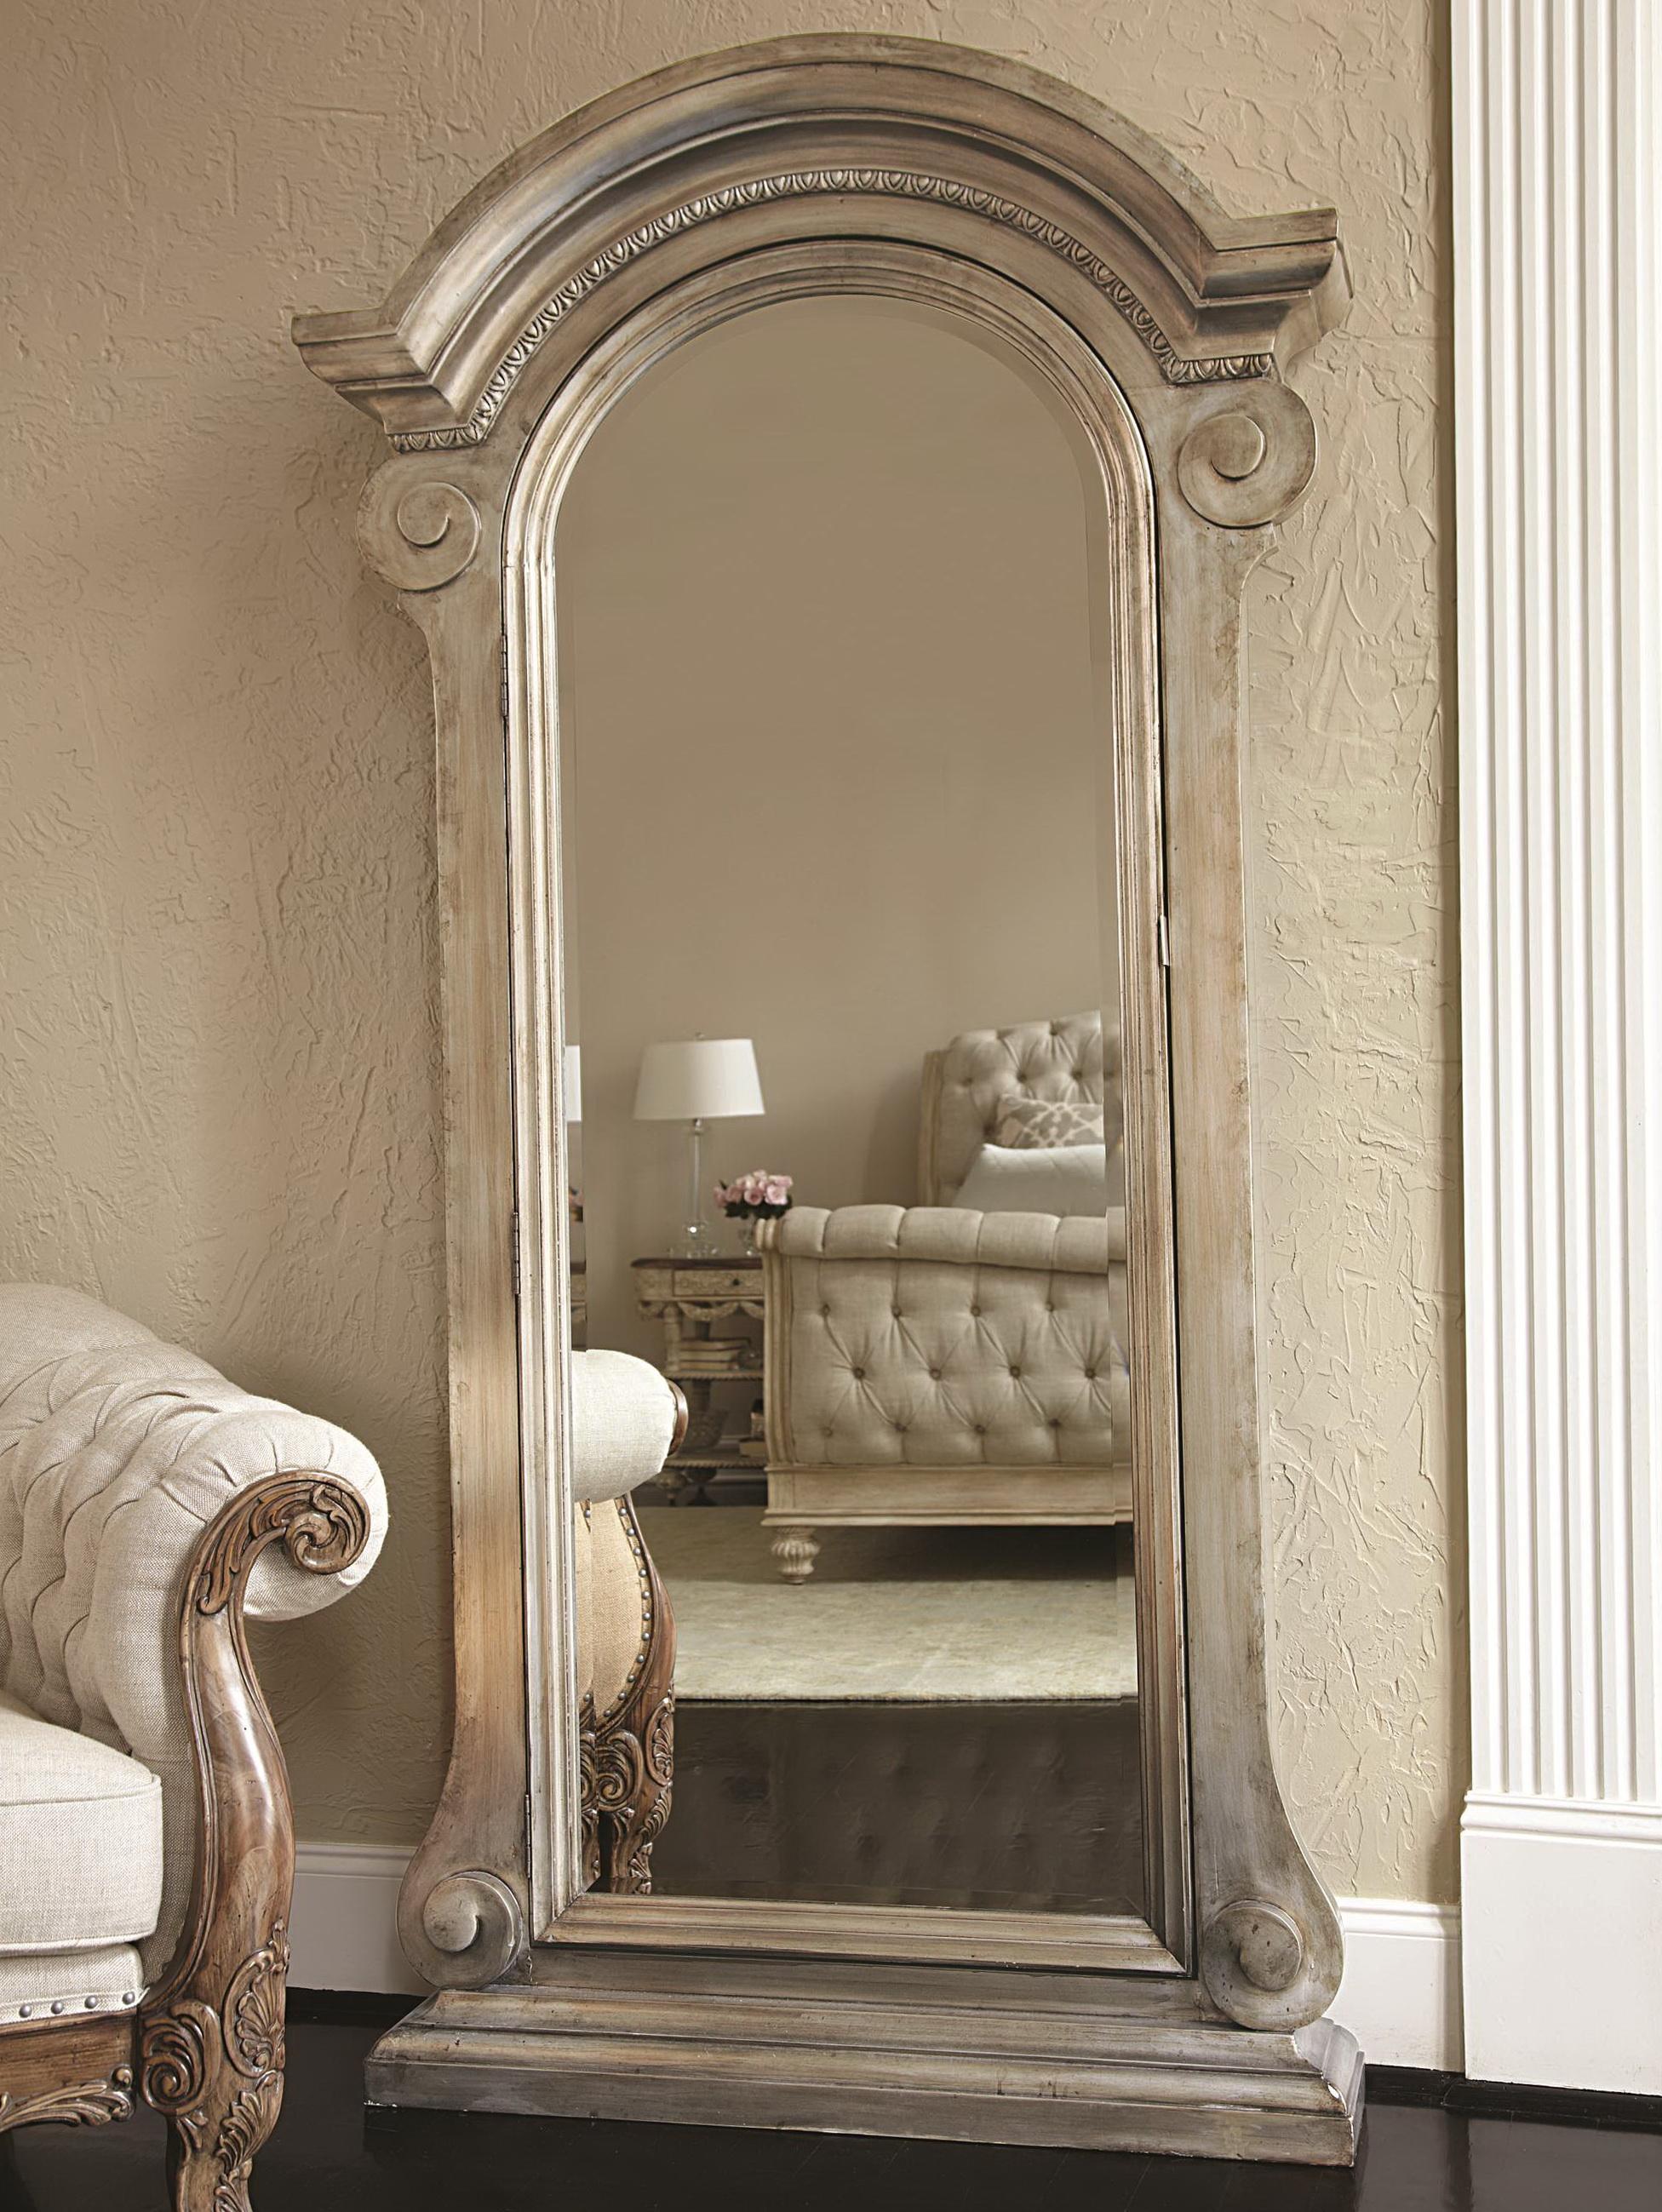 floor mirror with jewelry storage home design ideas. Black Bedroom Furniture Sets. Home Design Ideas